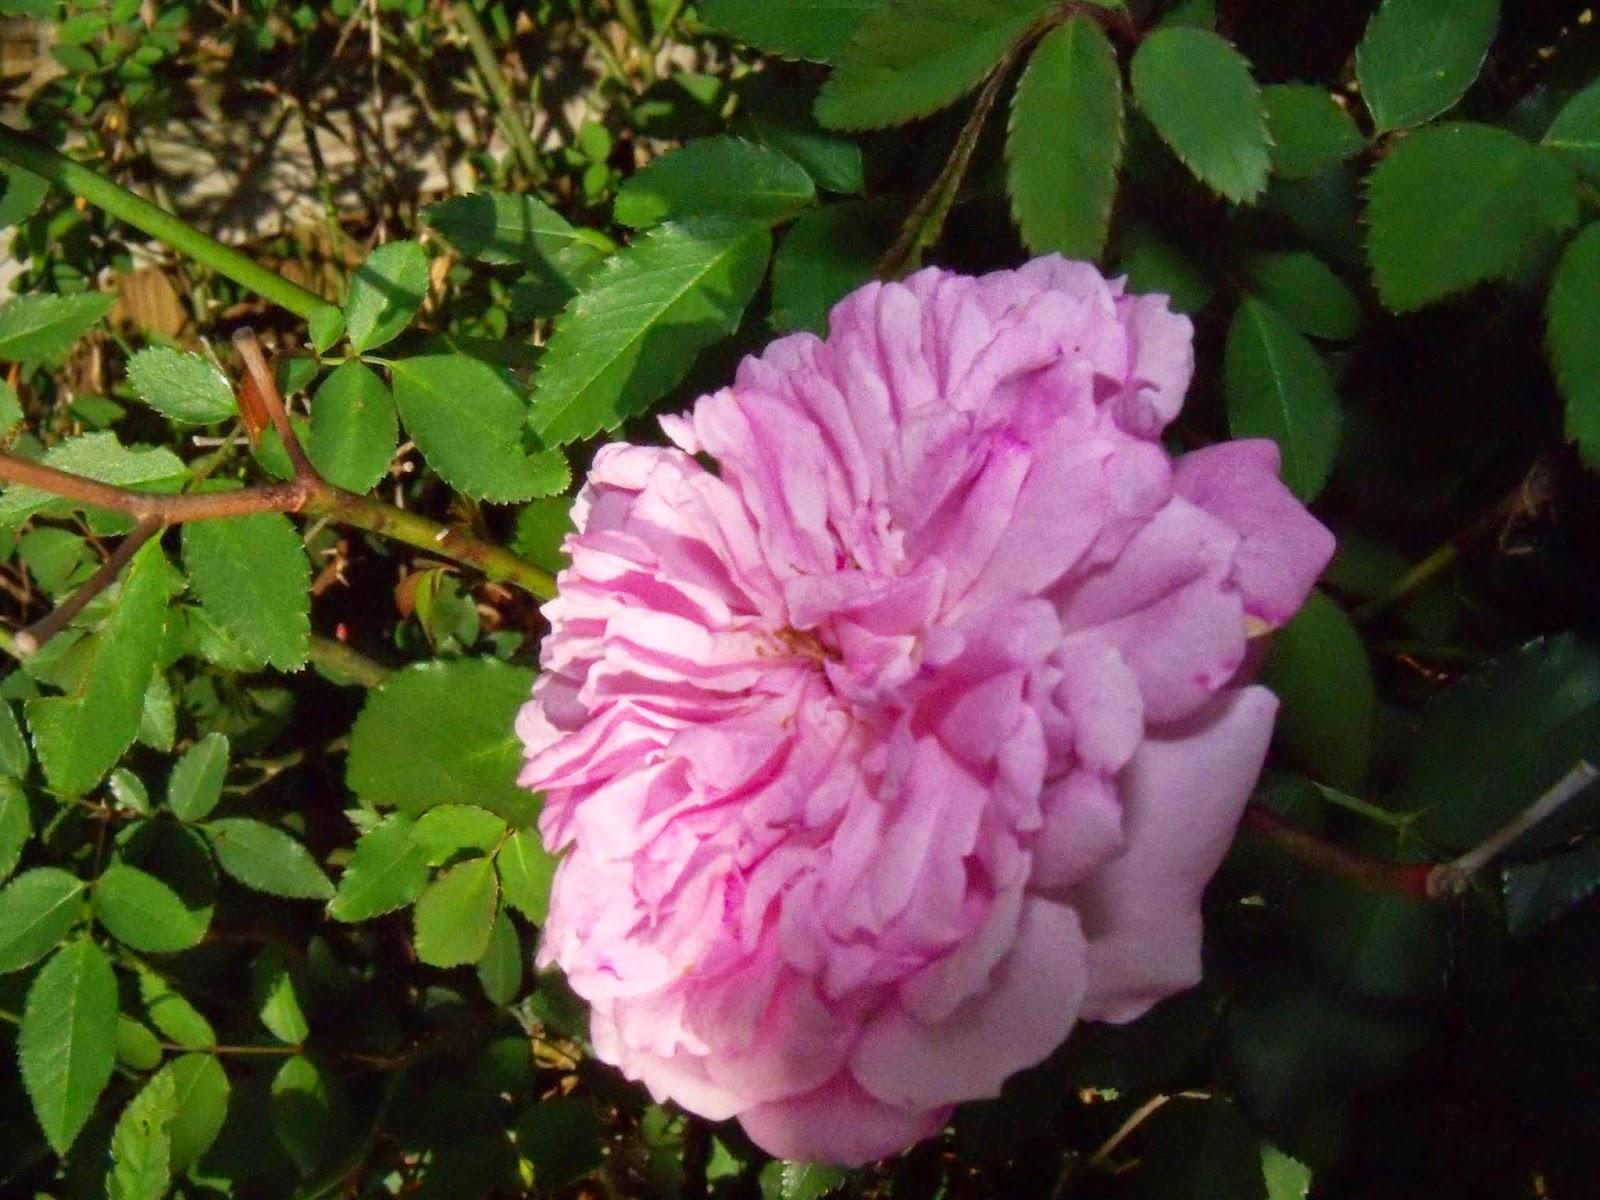 Gardening 2015 - 116_7633.JPG